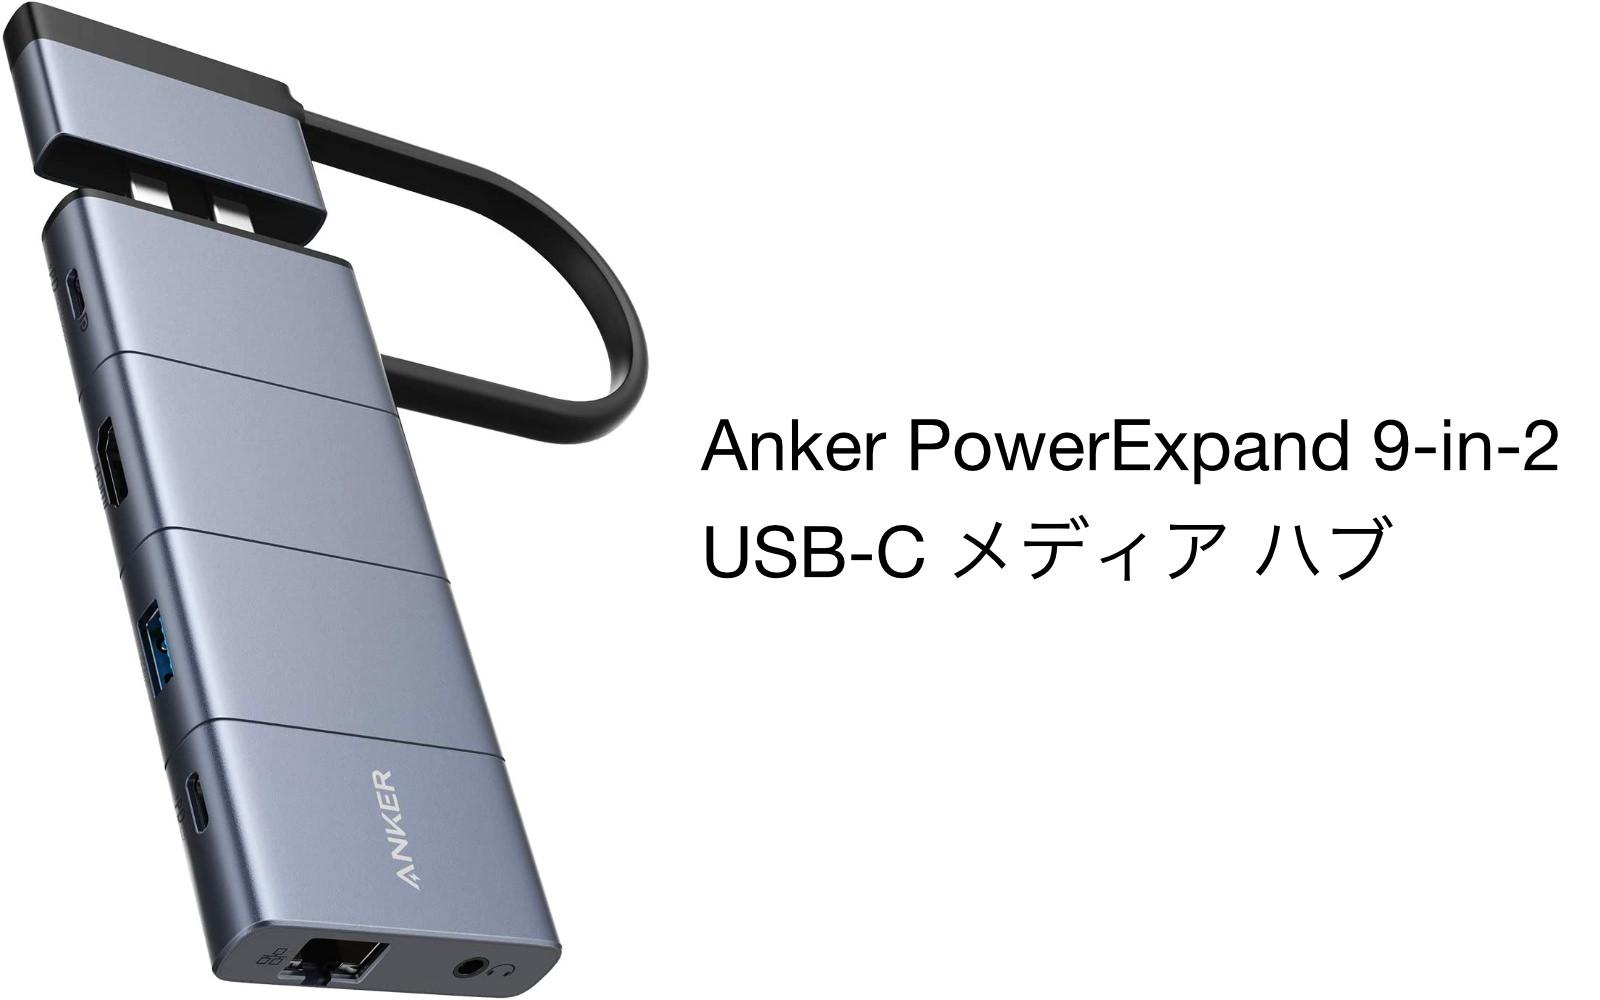 Anker PowerExpand 9 in 2 usbc media hub